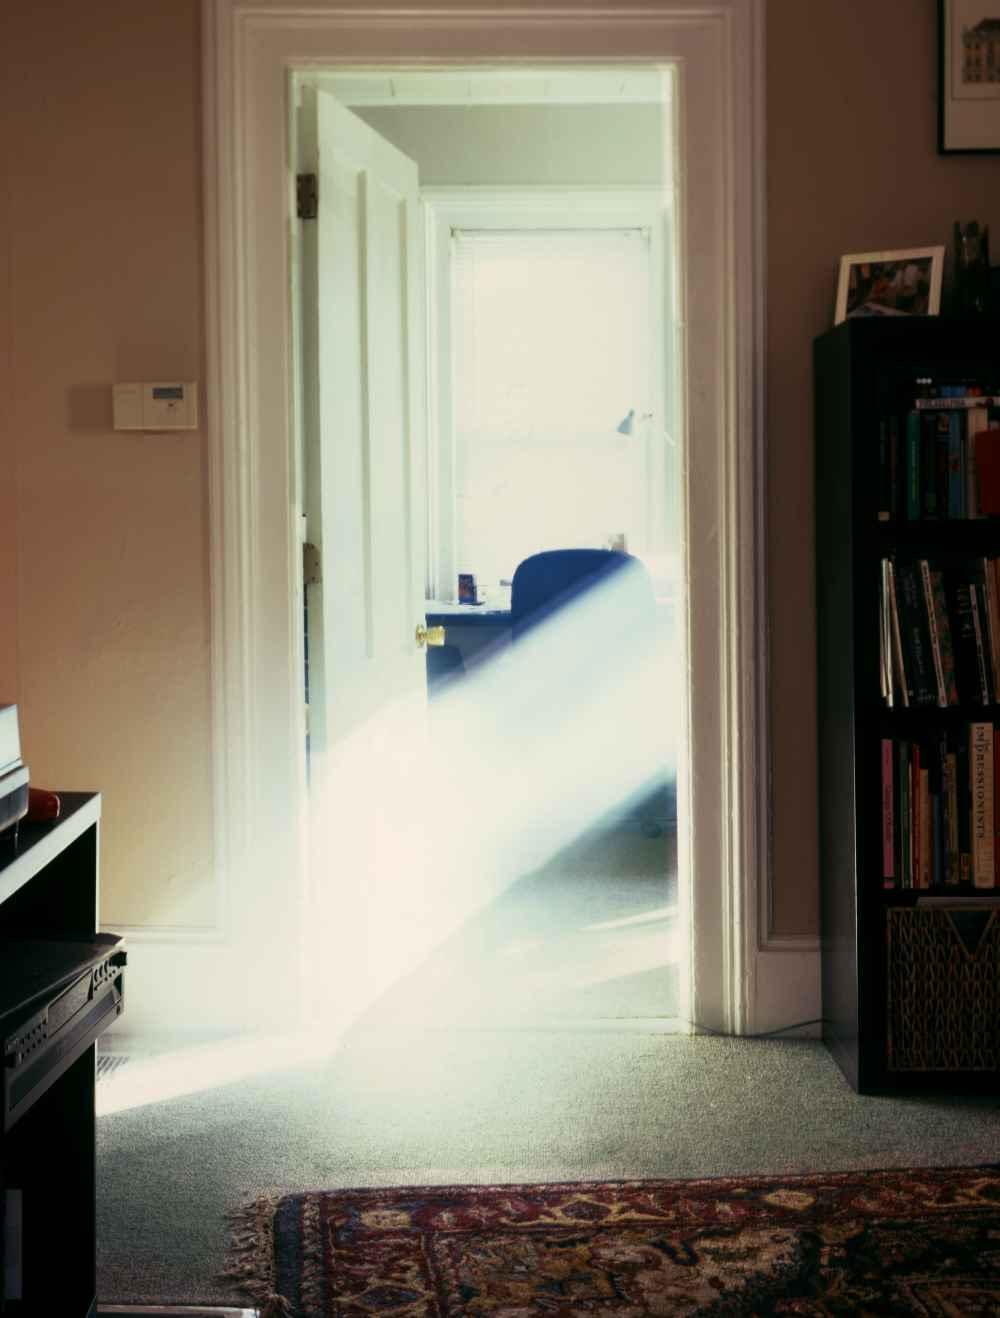 Visible Light: Artist Alexander Harding Reveals Dense Rays of Sunlight Pouring through Windows light